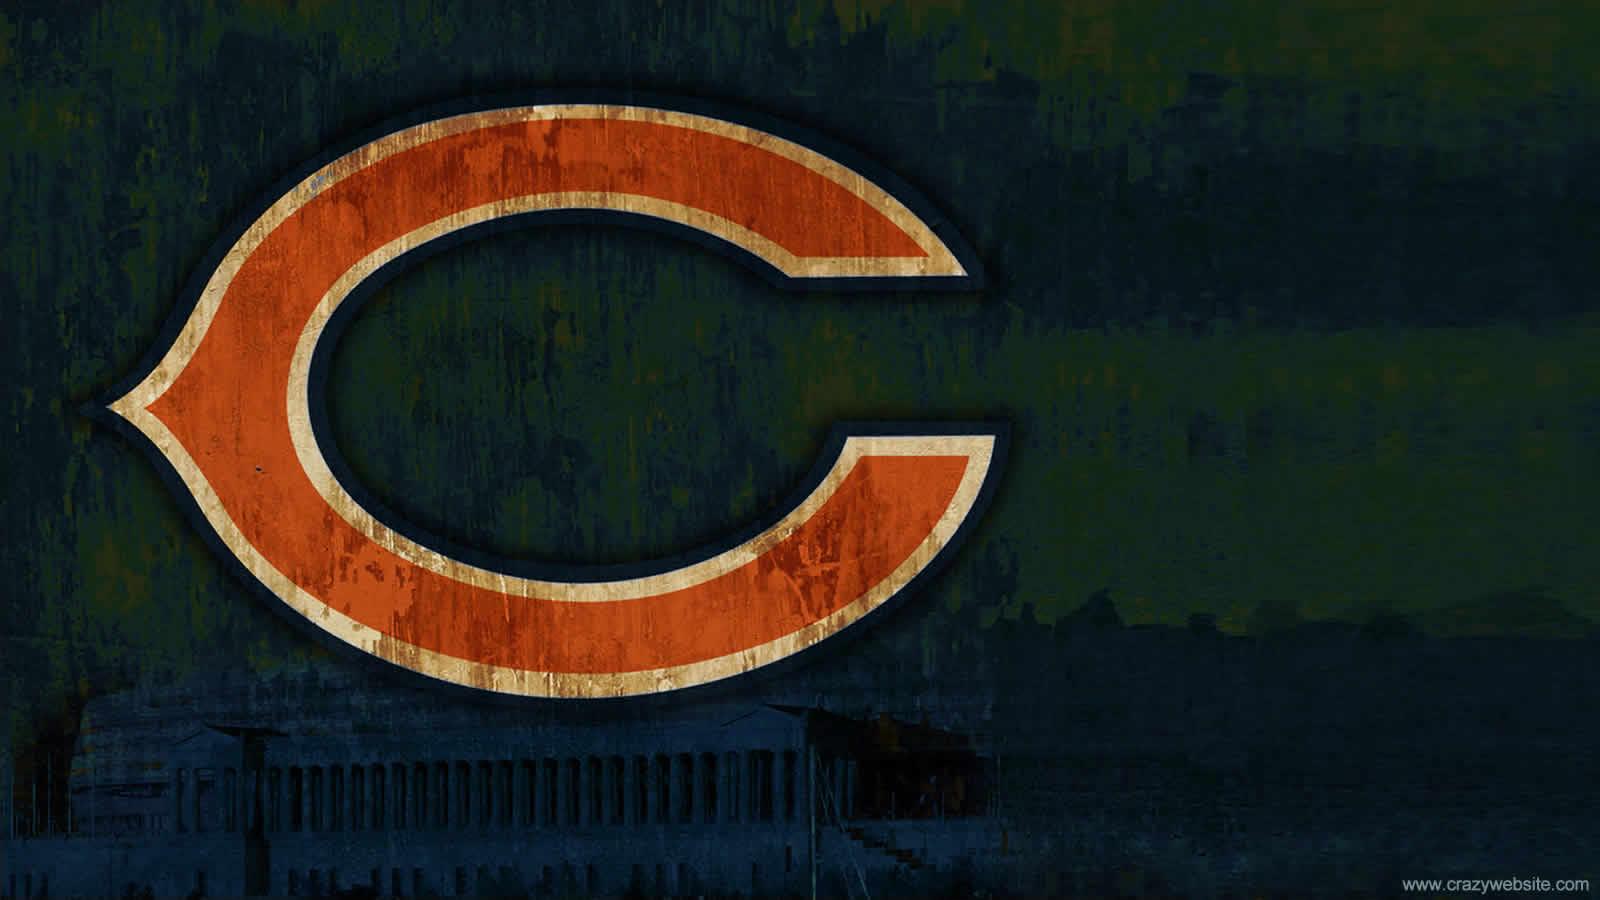 Chicago Bears 1600x900